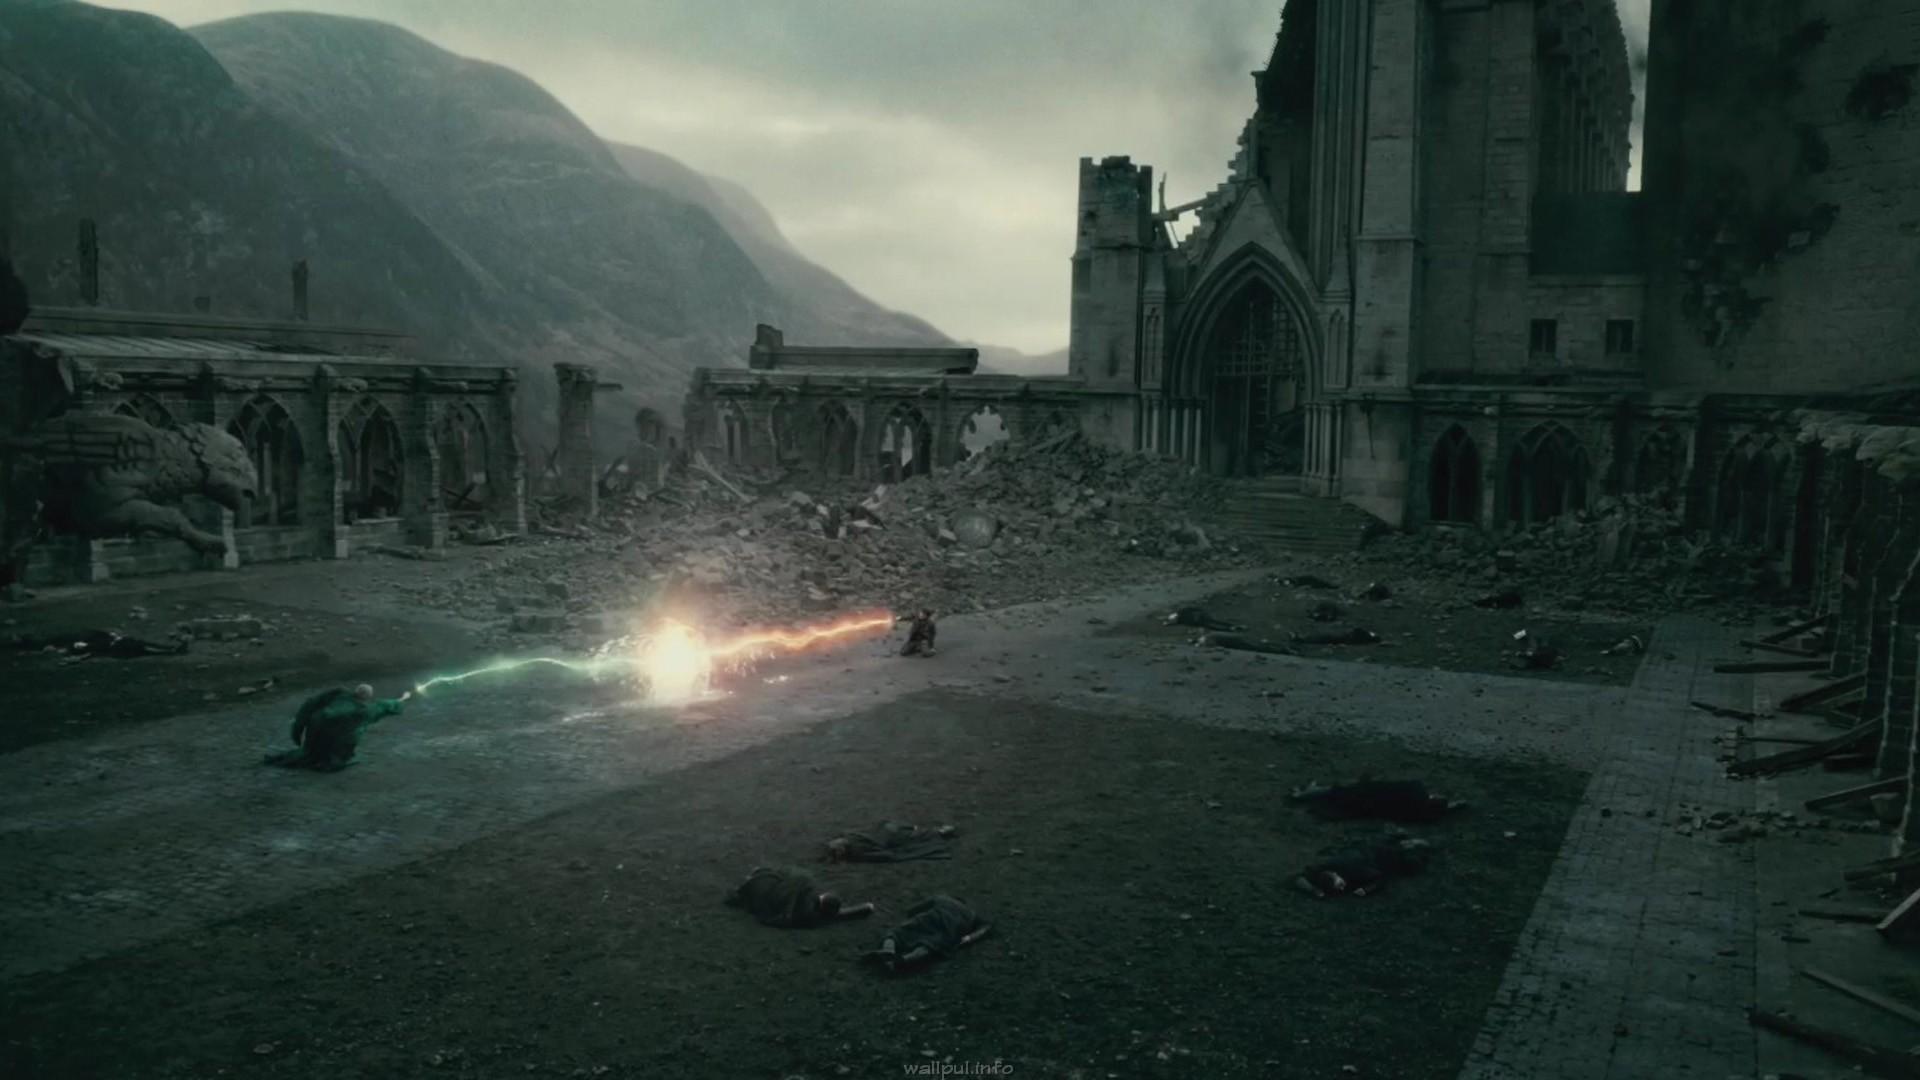 … Movie Harry Potter Wallpaper Widescreen Hd 1080p …